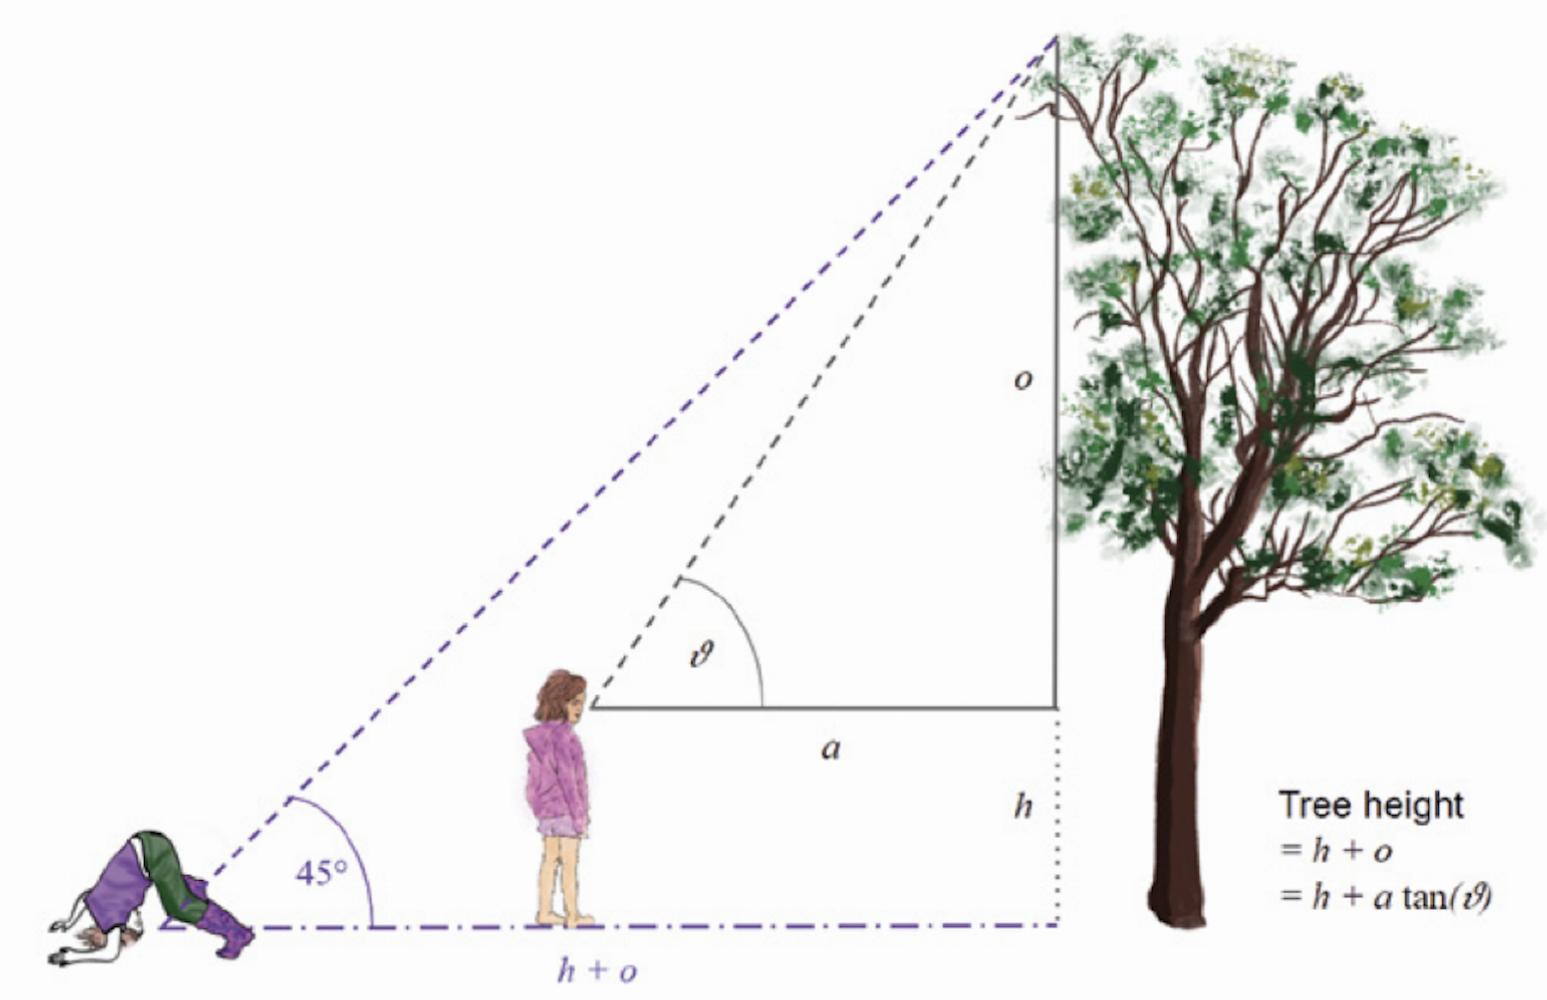 Exploring the interface of ecology, mathematics, and digital making | Hello World #11 - Raspberry Pi